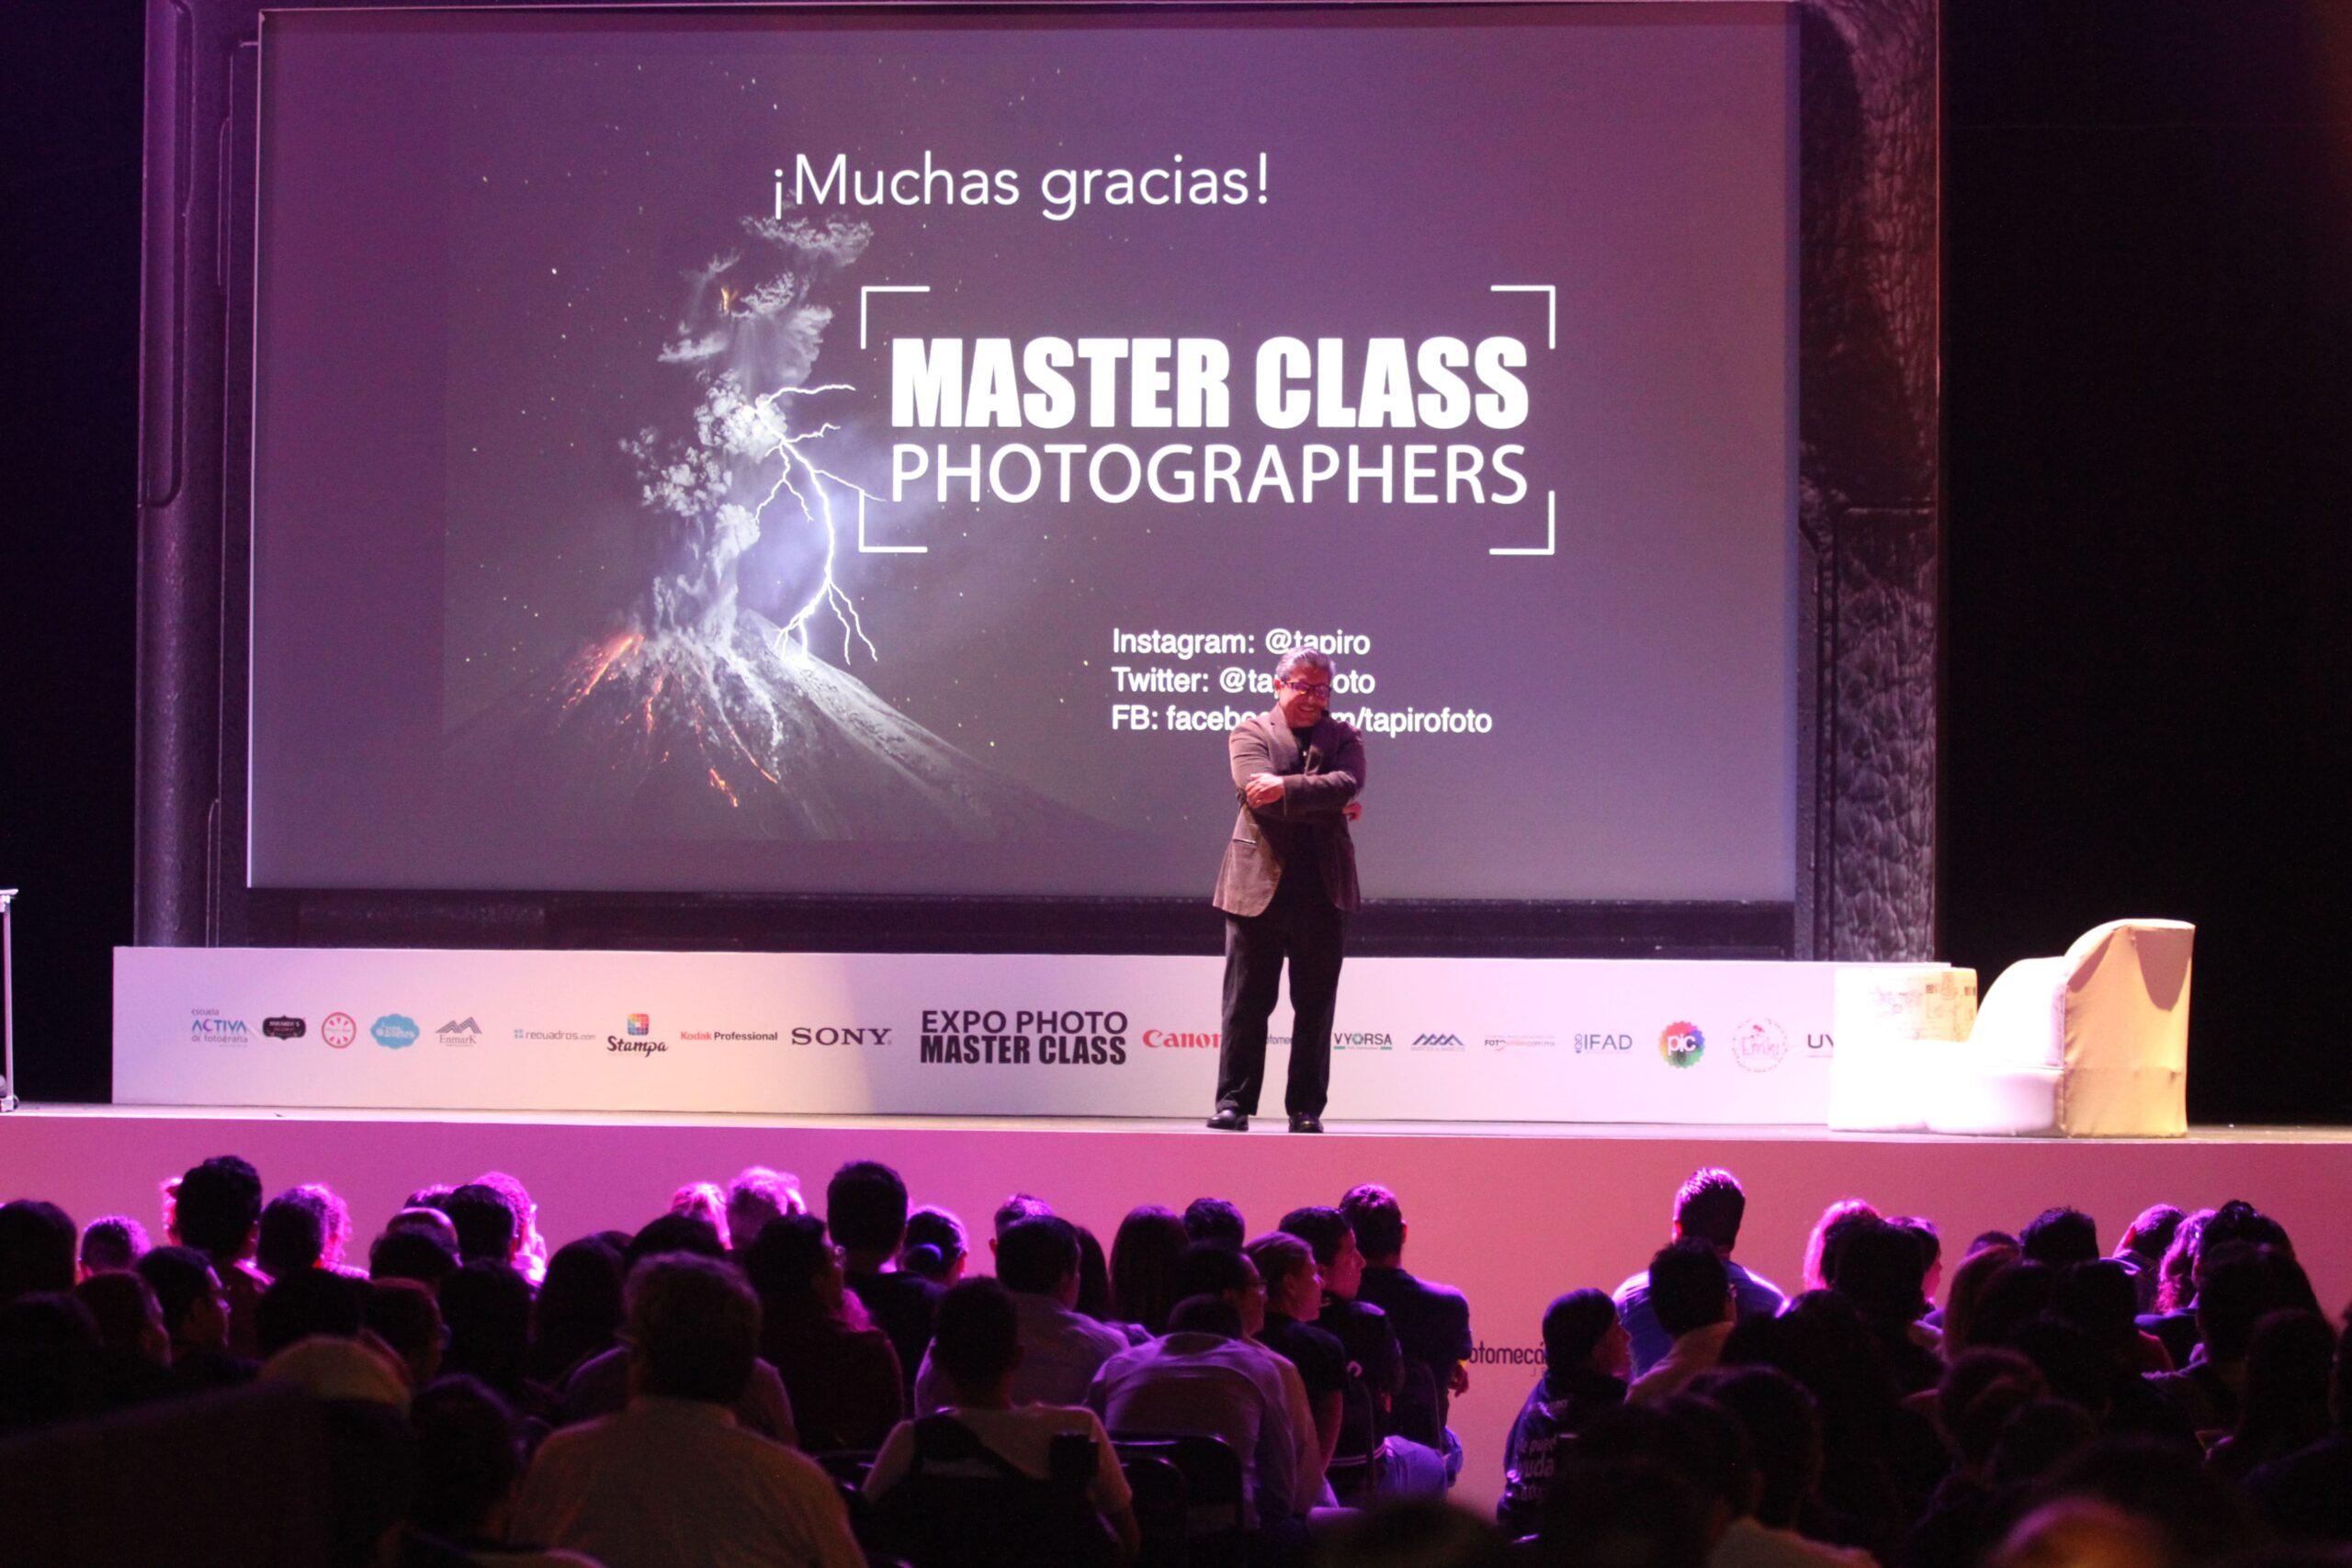 Expo Photo Master Class Live